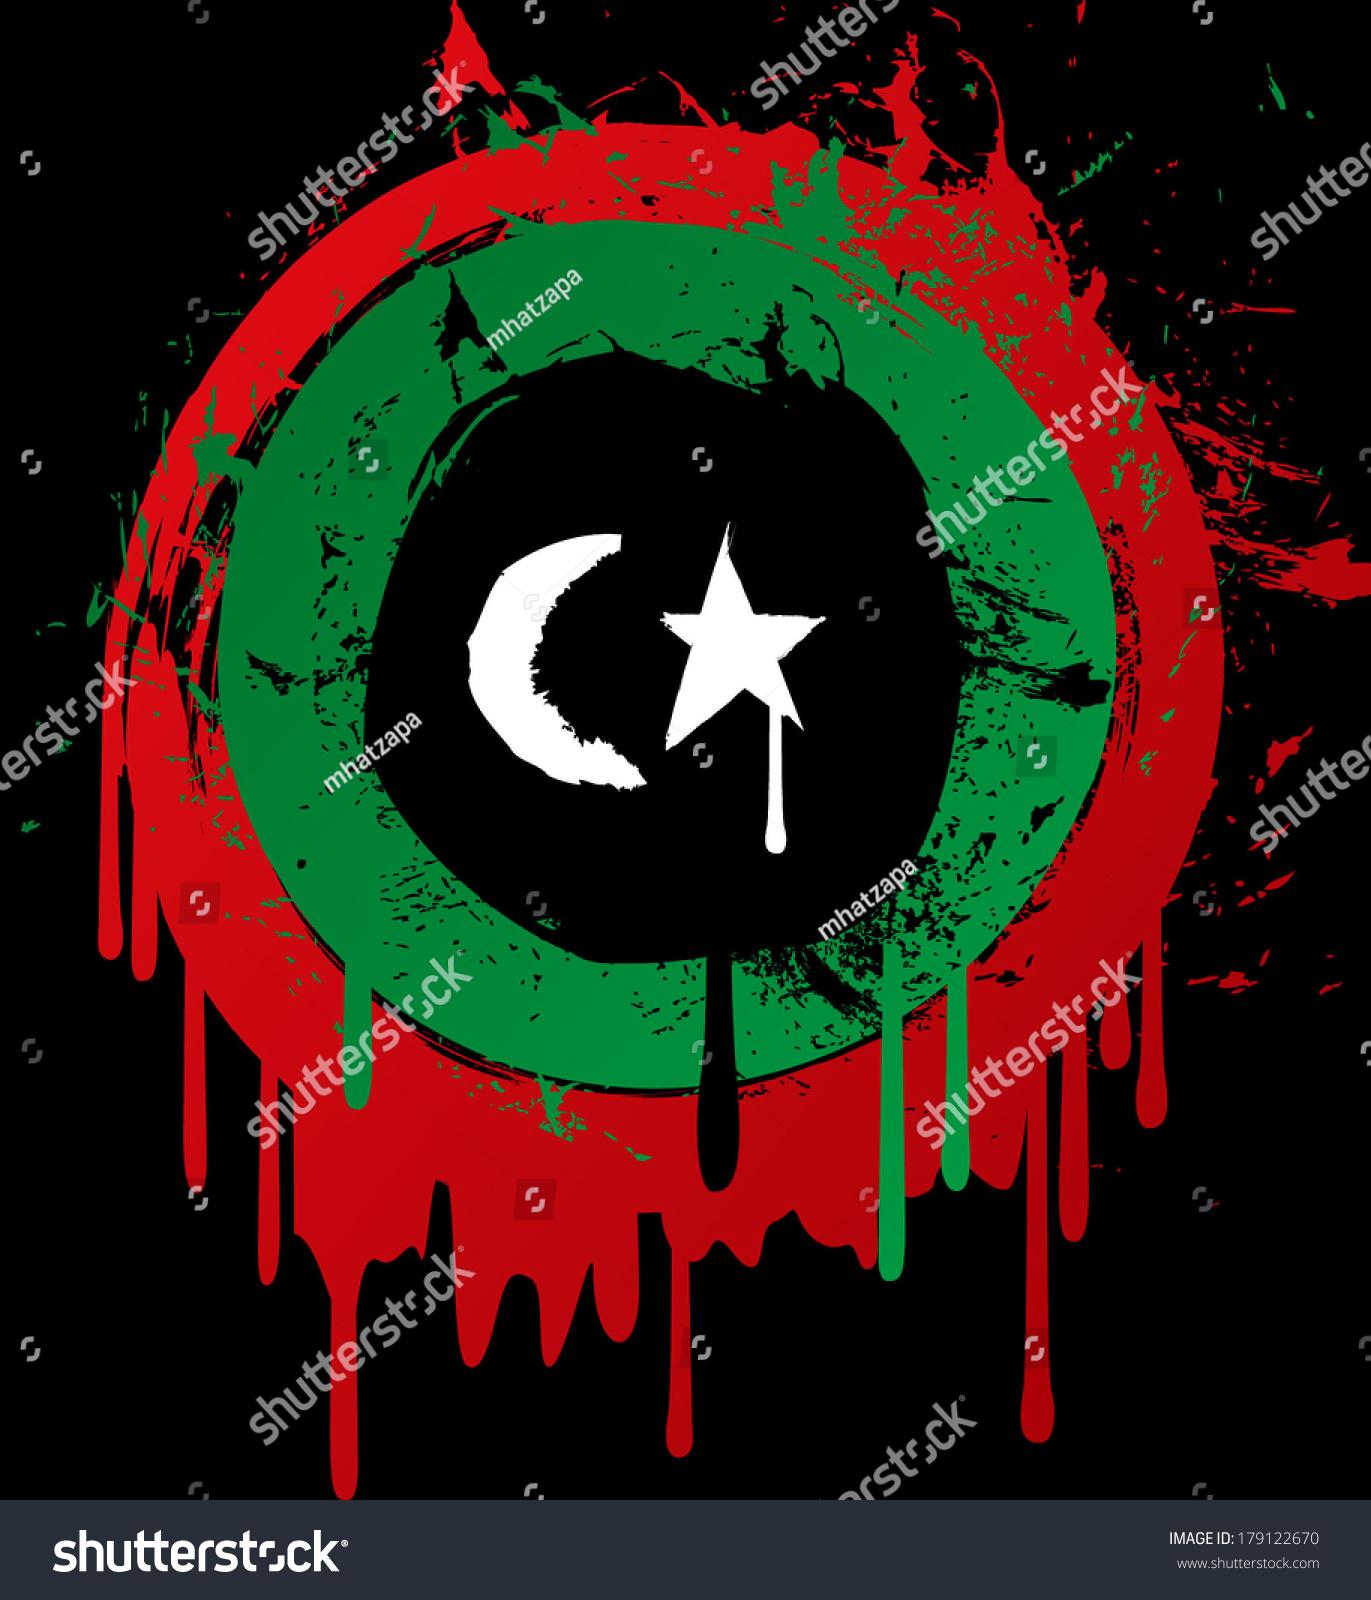 Libya Grunge Flag On Black Background Stock Illustration 179122670 ...